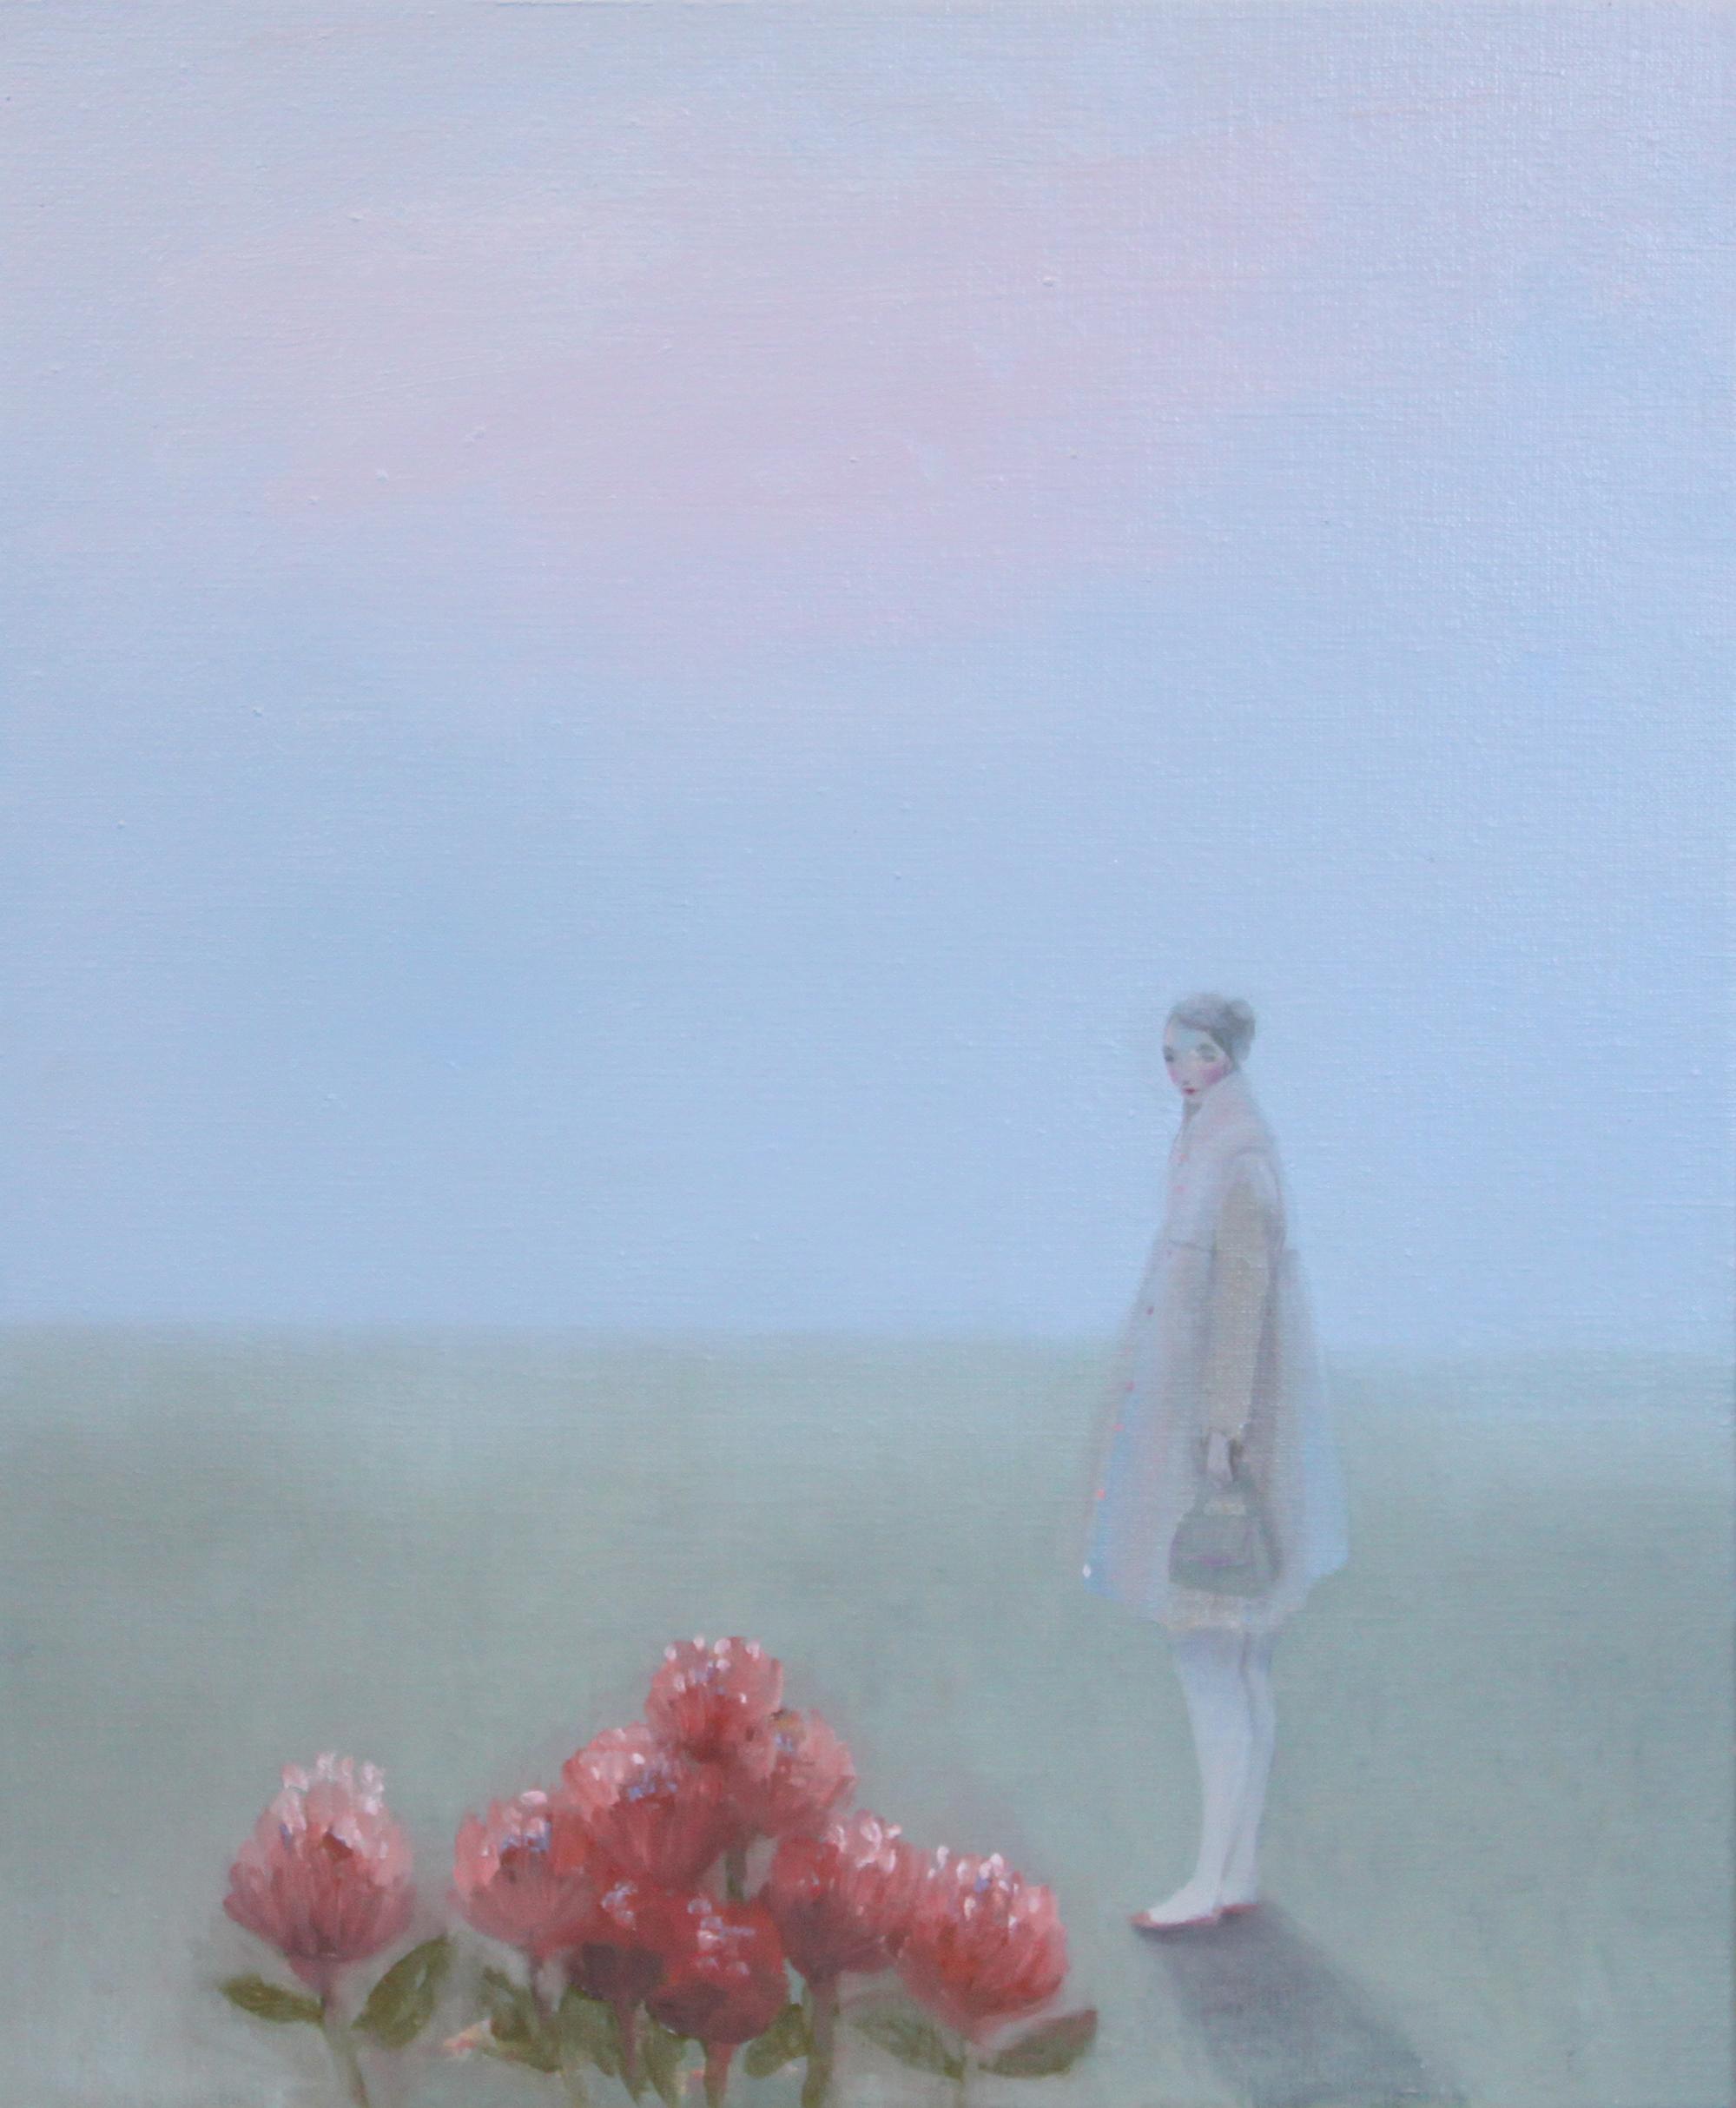 K r i s t i n V e s t g a r d  Autumn Steps 40 x 50 cm oil on canvas £ 2300